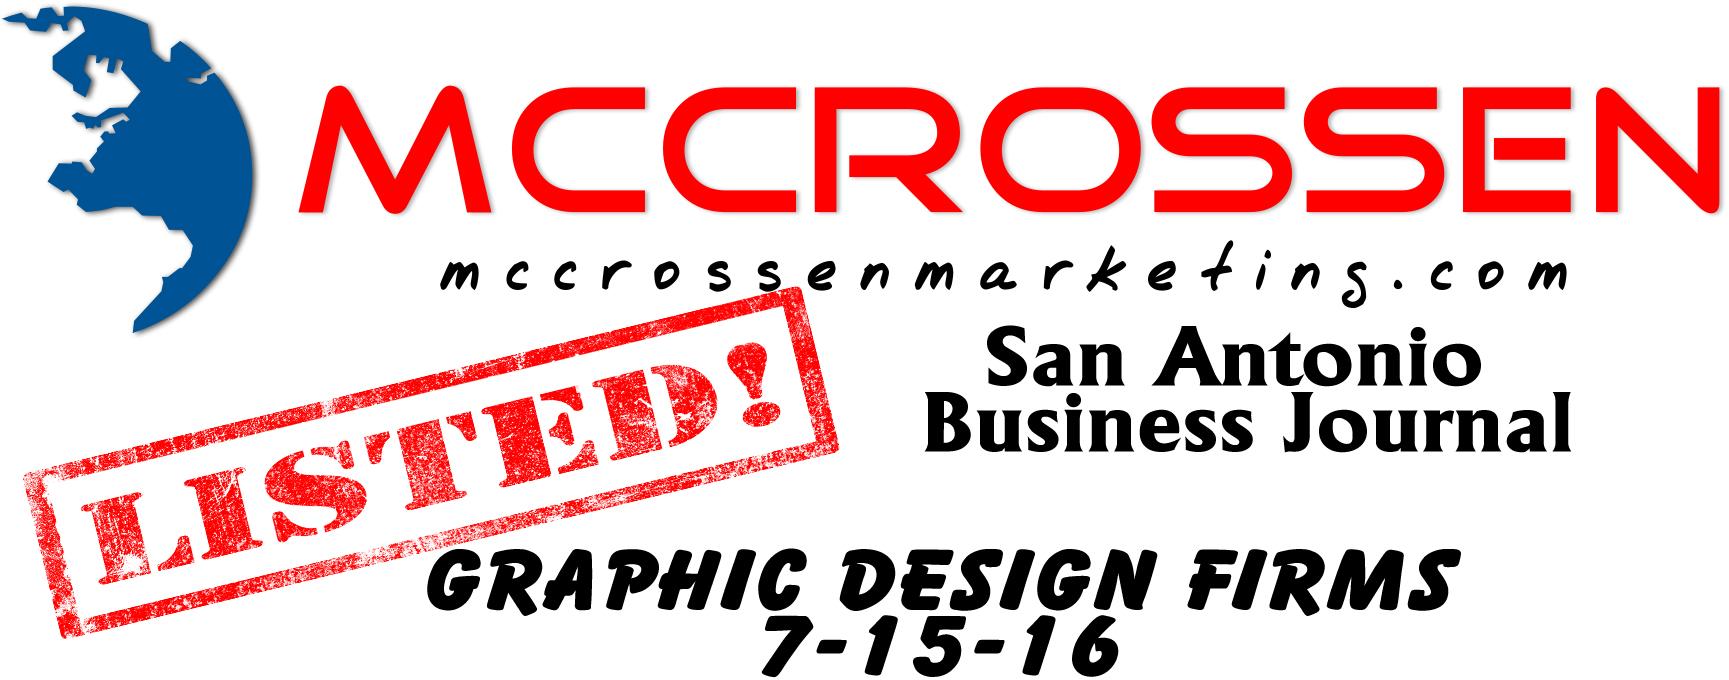 San Antonio Business Journal Graphic Design Firms List July 2016